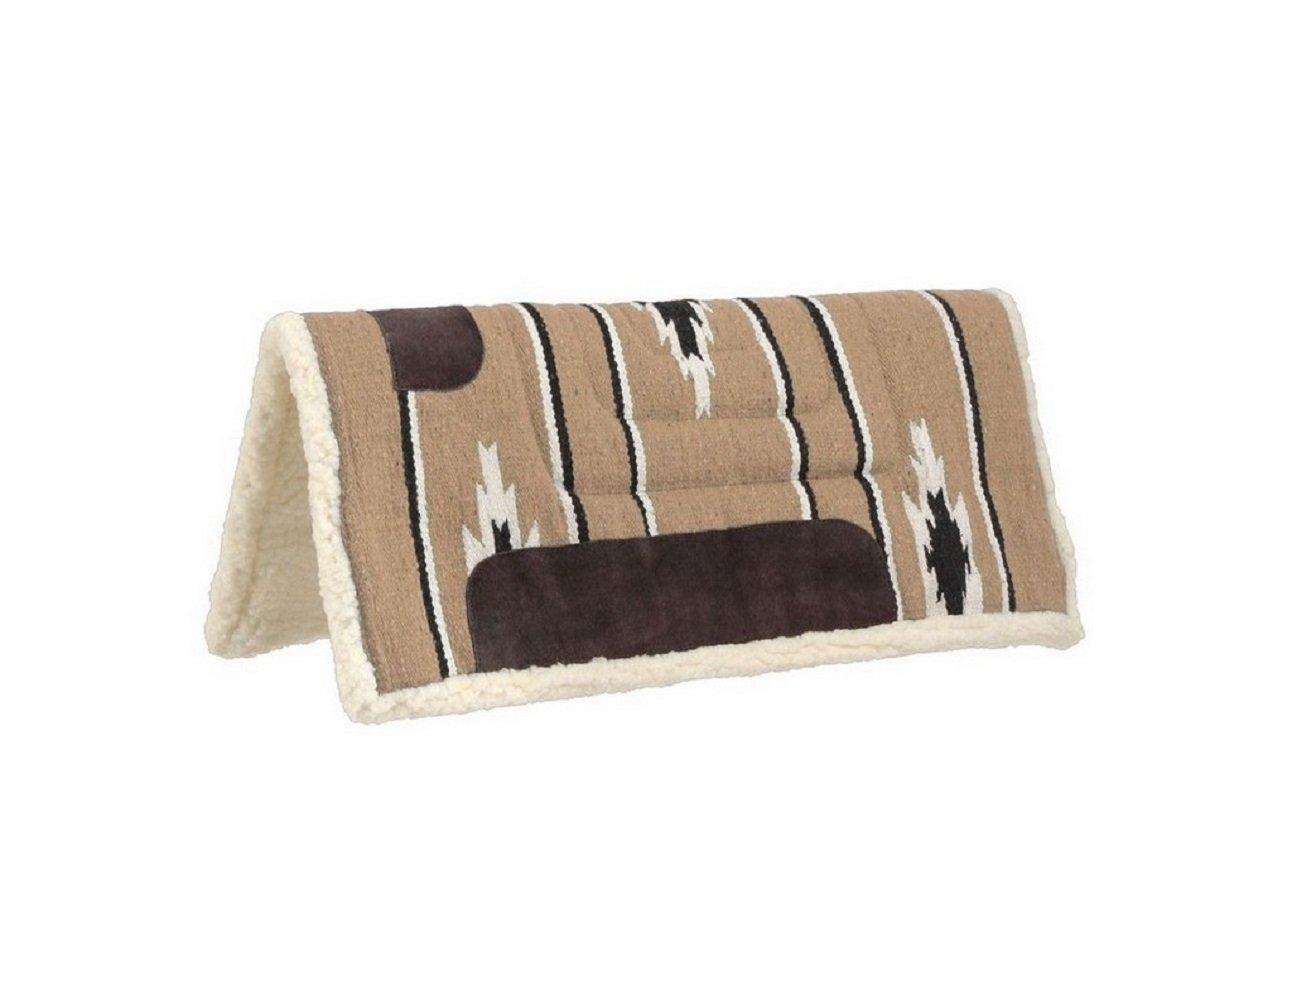 ABETTA, Saddle Blanket, Black, Small [1541597033-180180] - $17 21